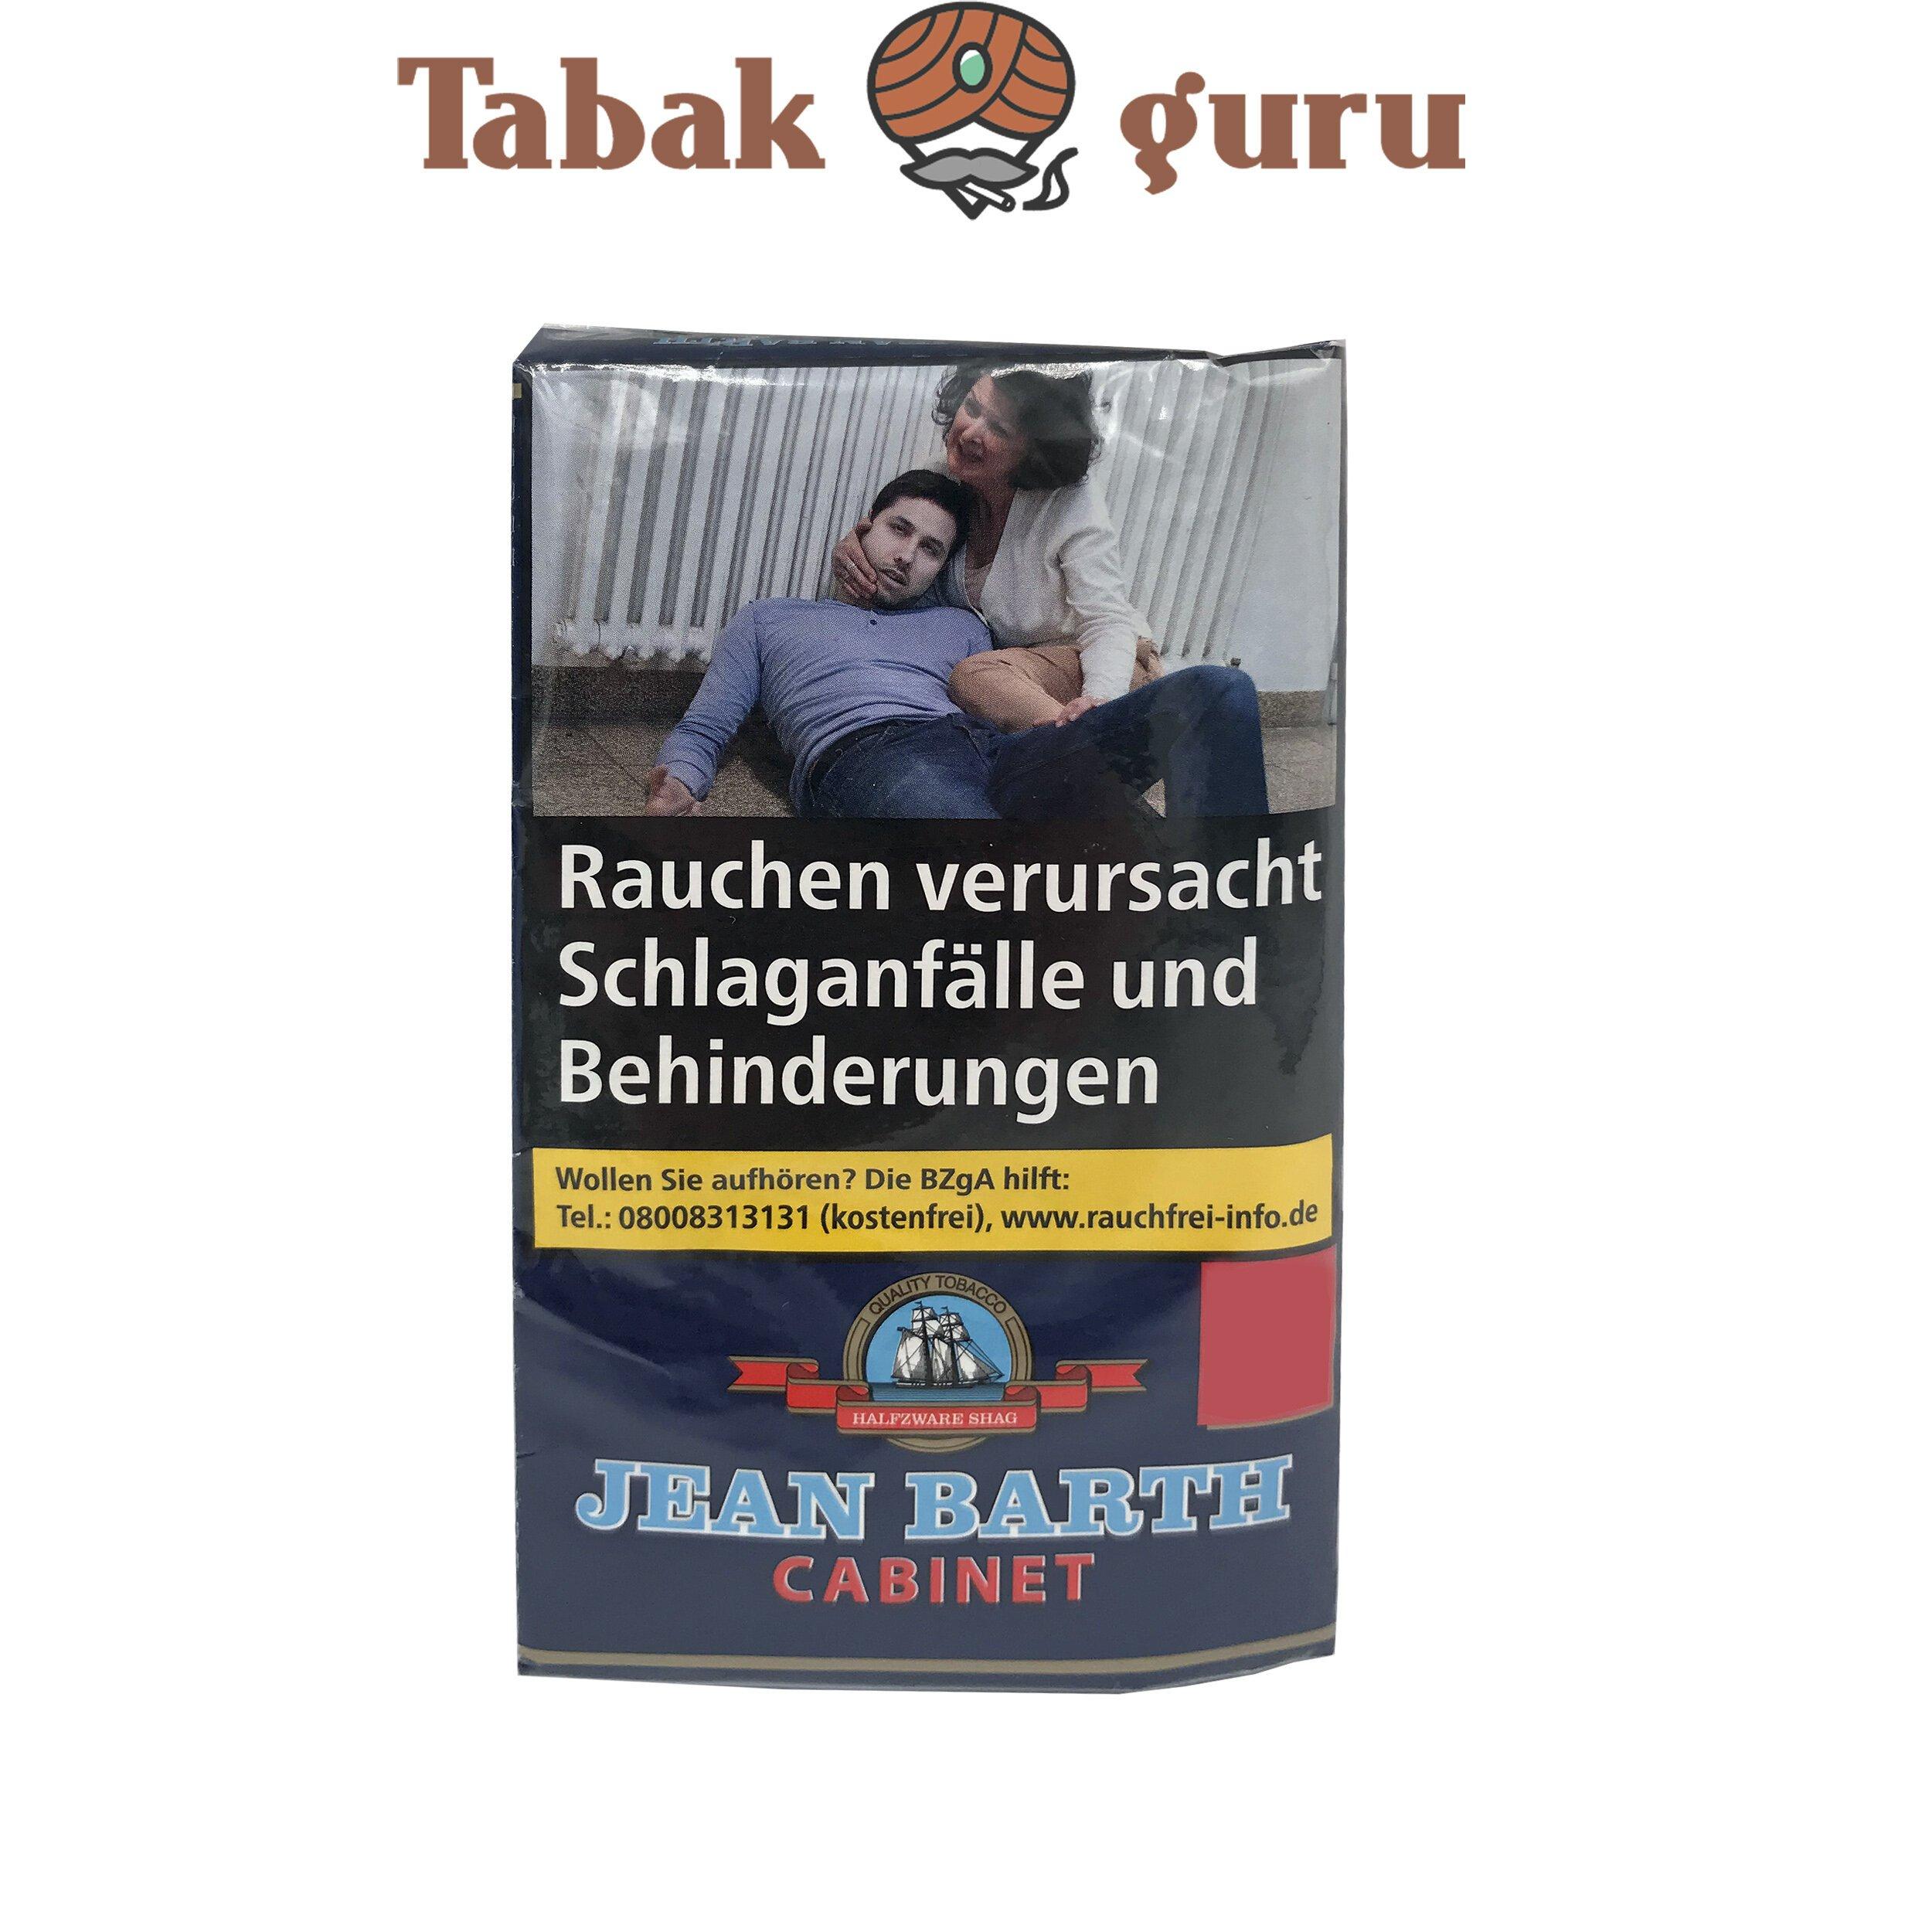 Jean Barth Cabinet Halfzware Shag 35g Drehtabak Zigarettentabak